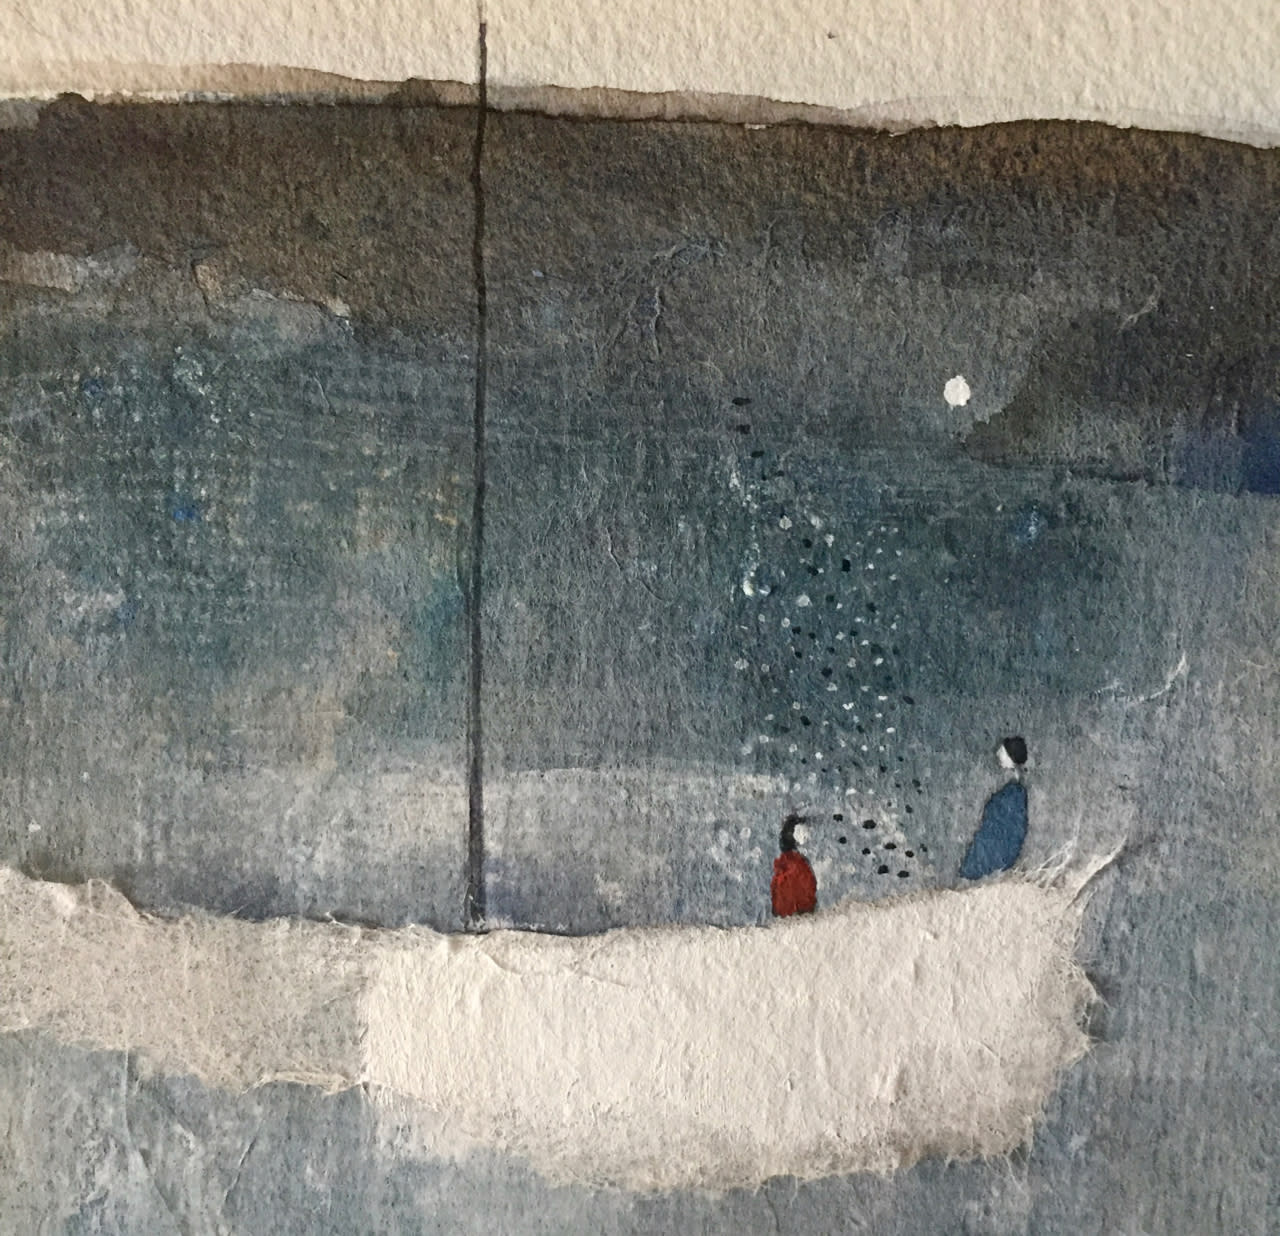 Julie Collins, BIG RIVER